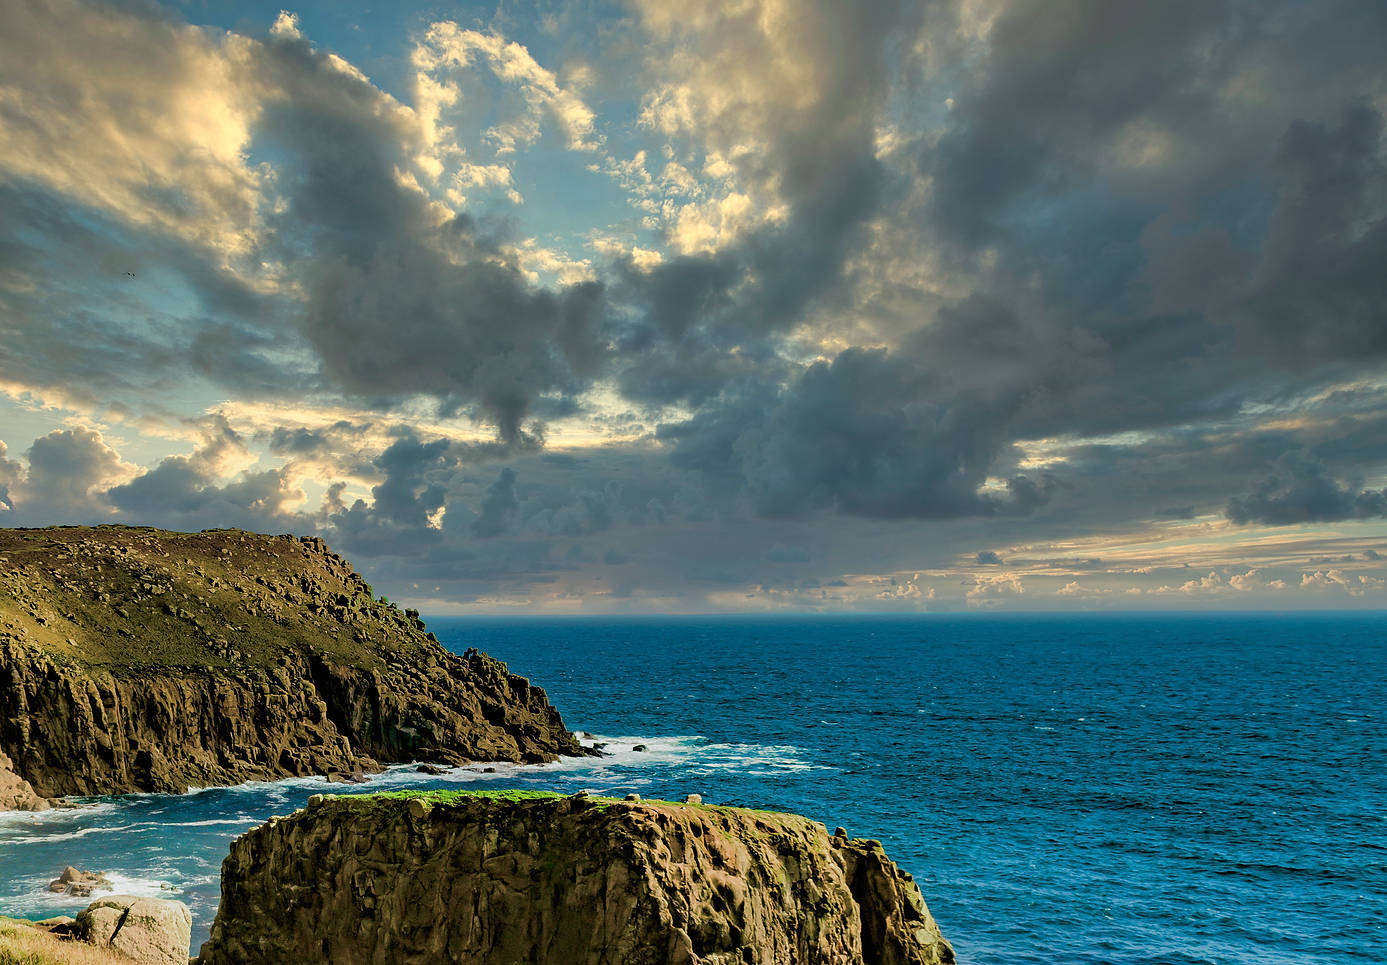 praa sands UK Off Coast-3.jpg